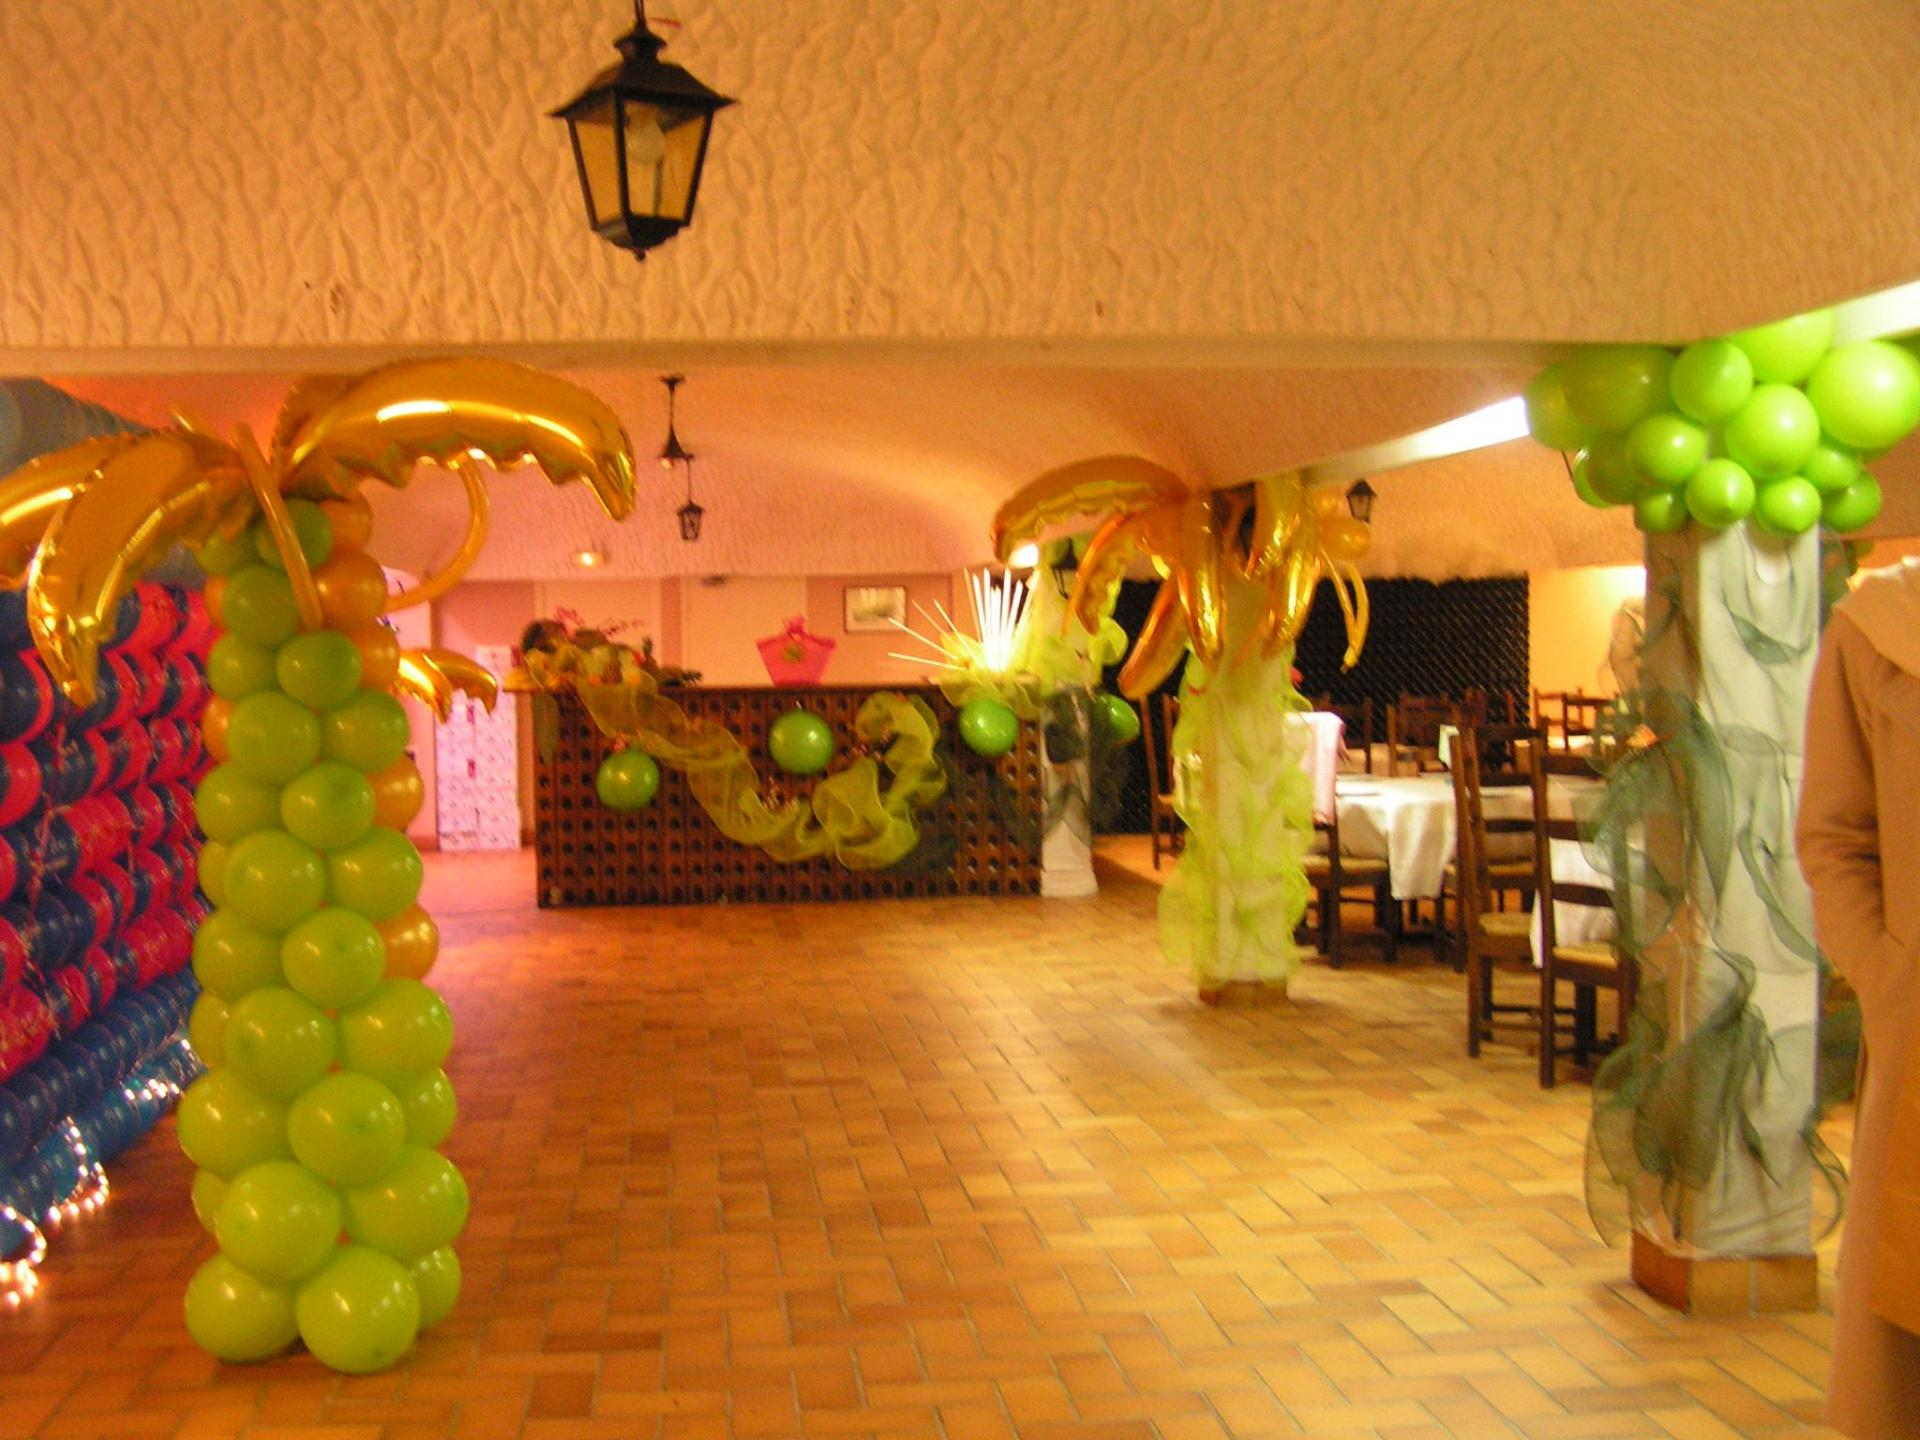 Décoration Ballons Mariage